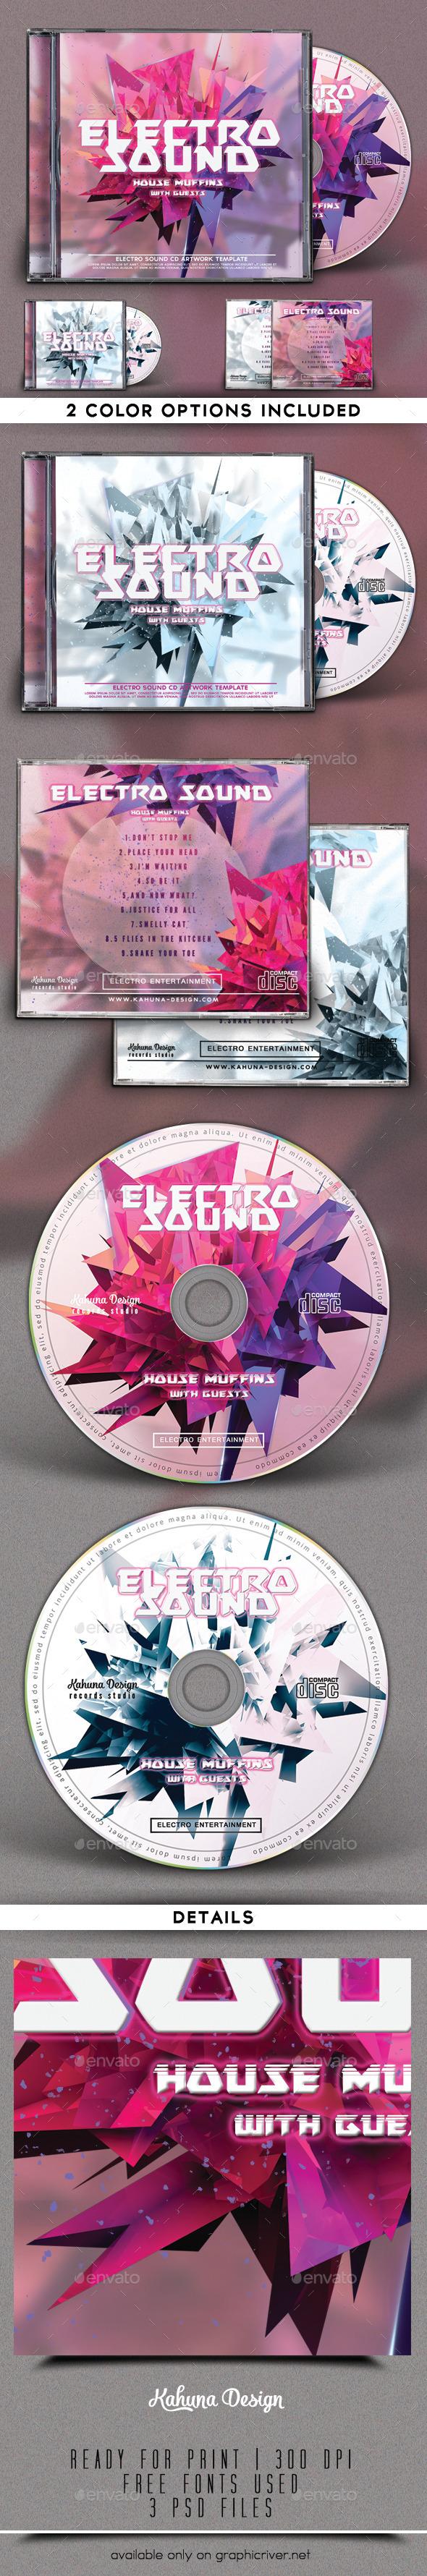 GraphicRiver Electro Sound CD Artwork 9269925